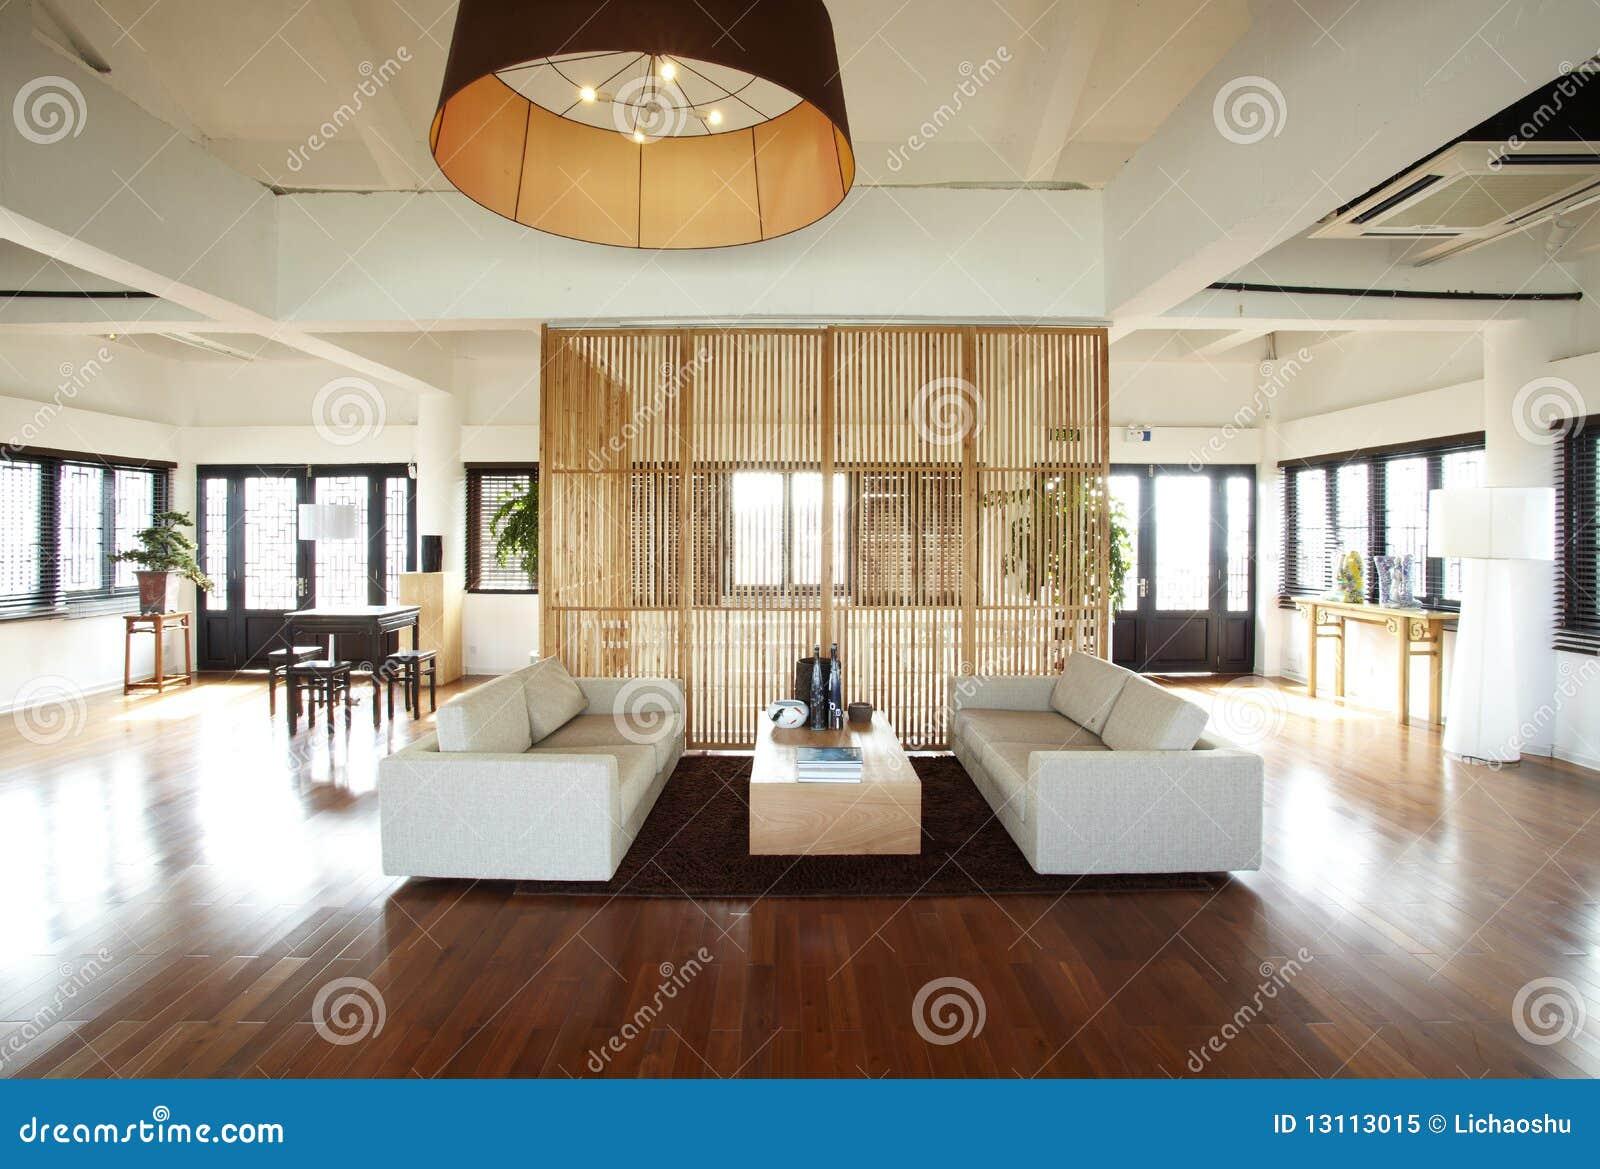 Modern hinese ype House oyalty Free Stock Photo - Image: 13113015 - ^